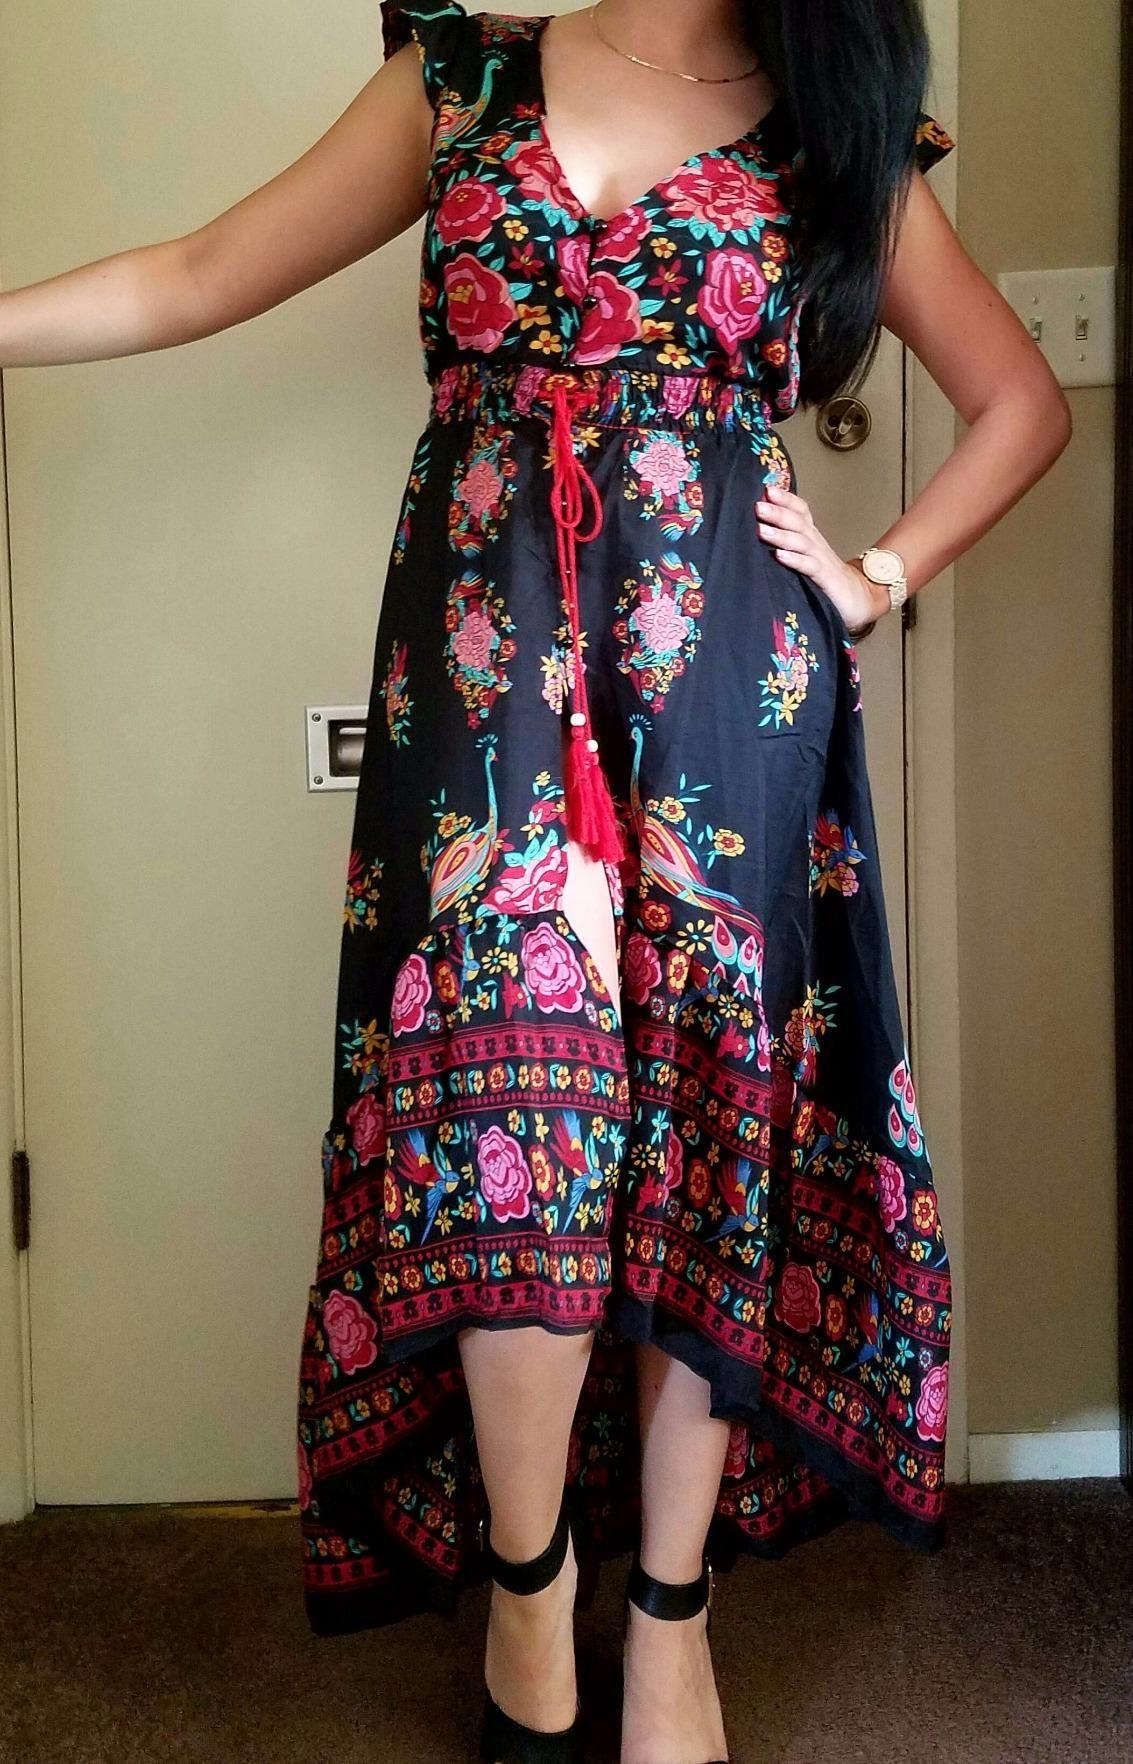 609bf9091b47d R.Vivimos Women Summer Vintage Floral Print Deep V Neck High Low Long  Dresses at Amazon Women's Clothing store: